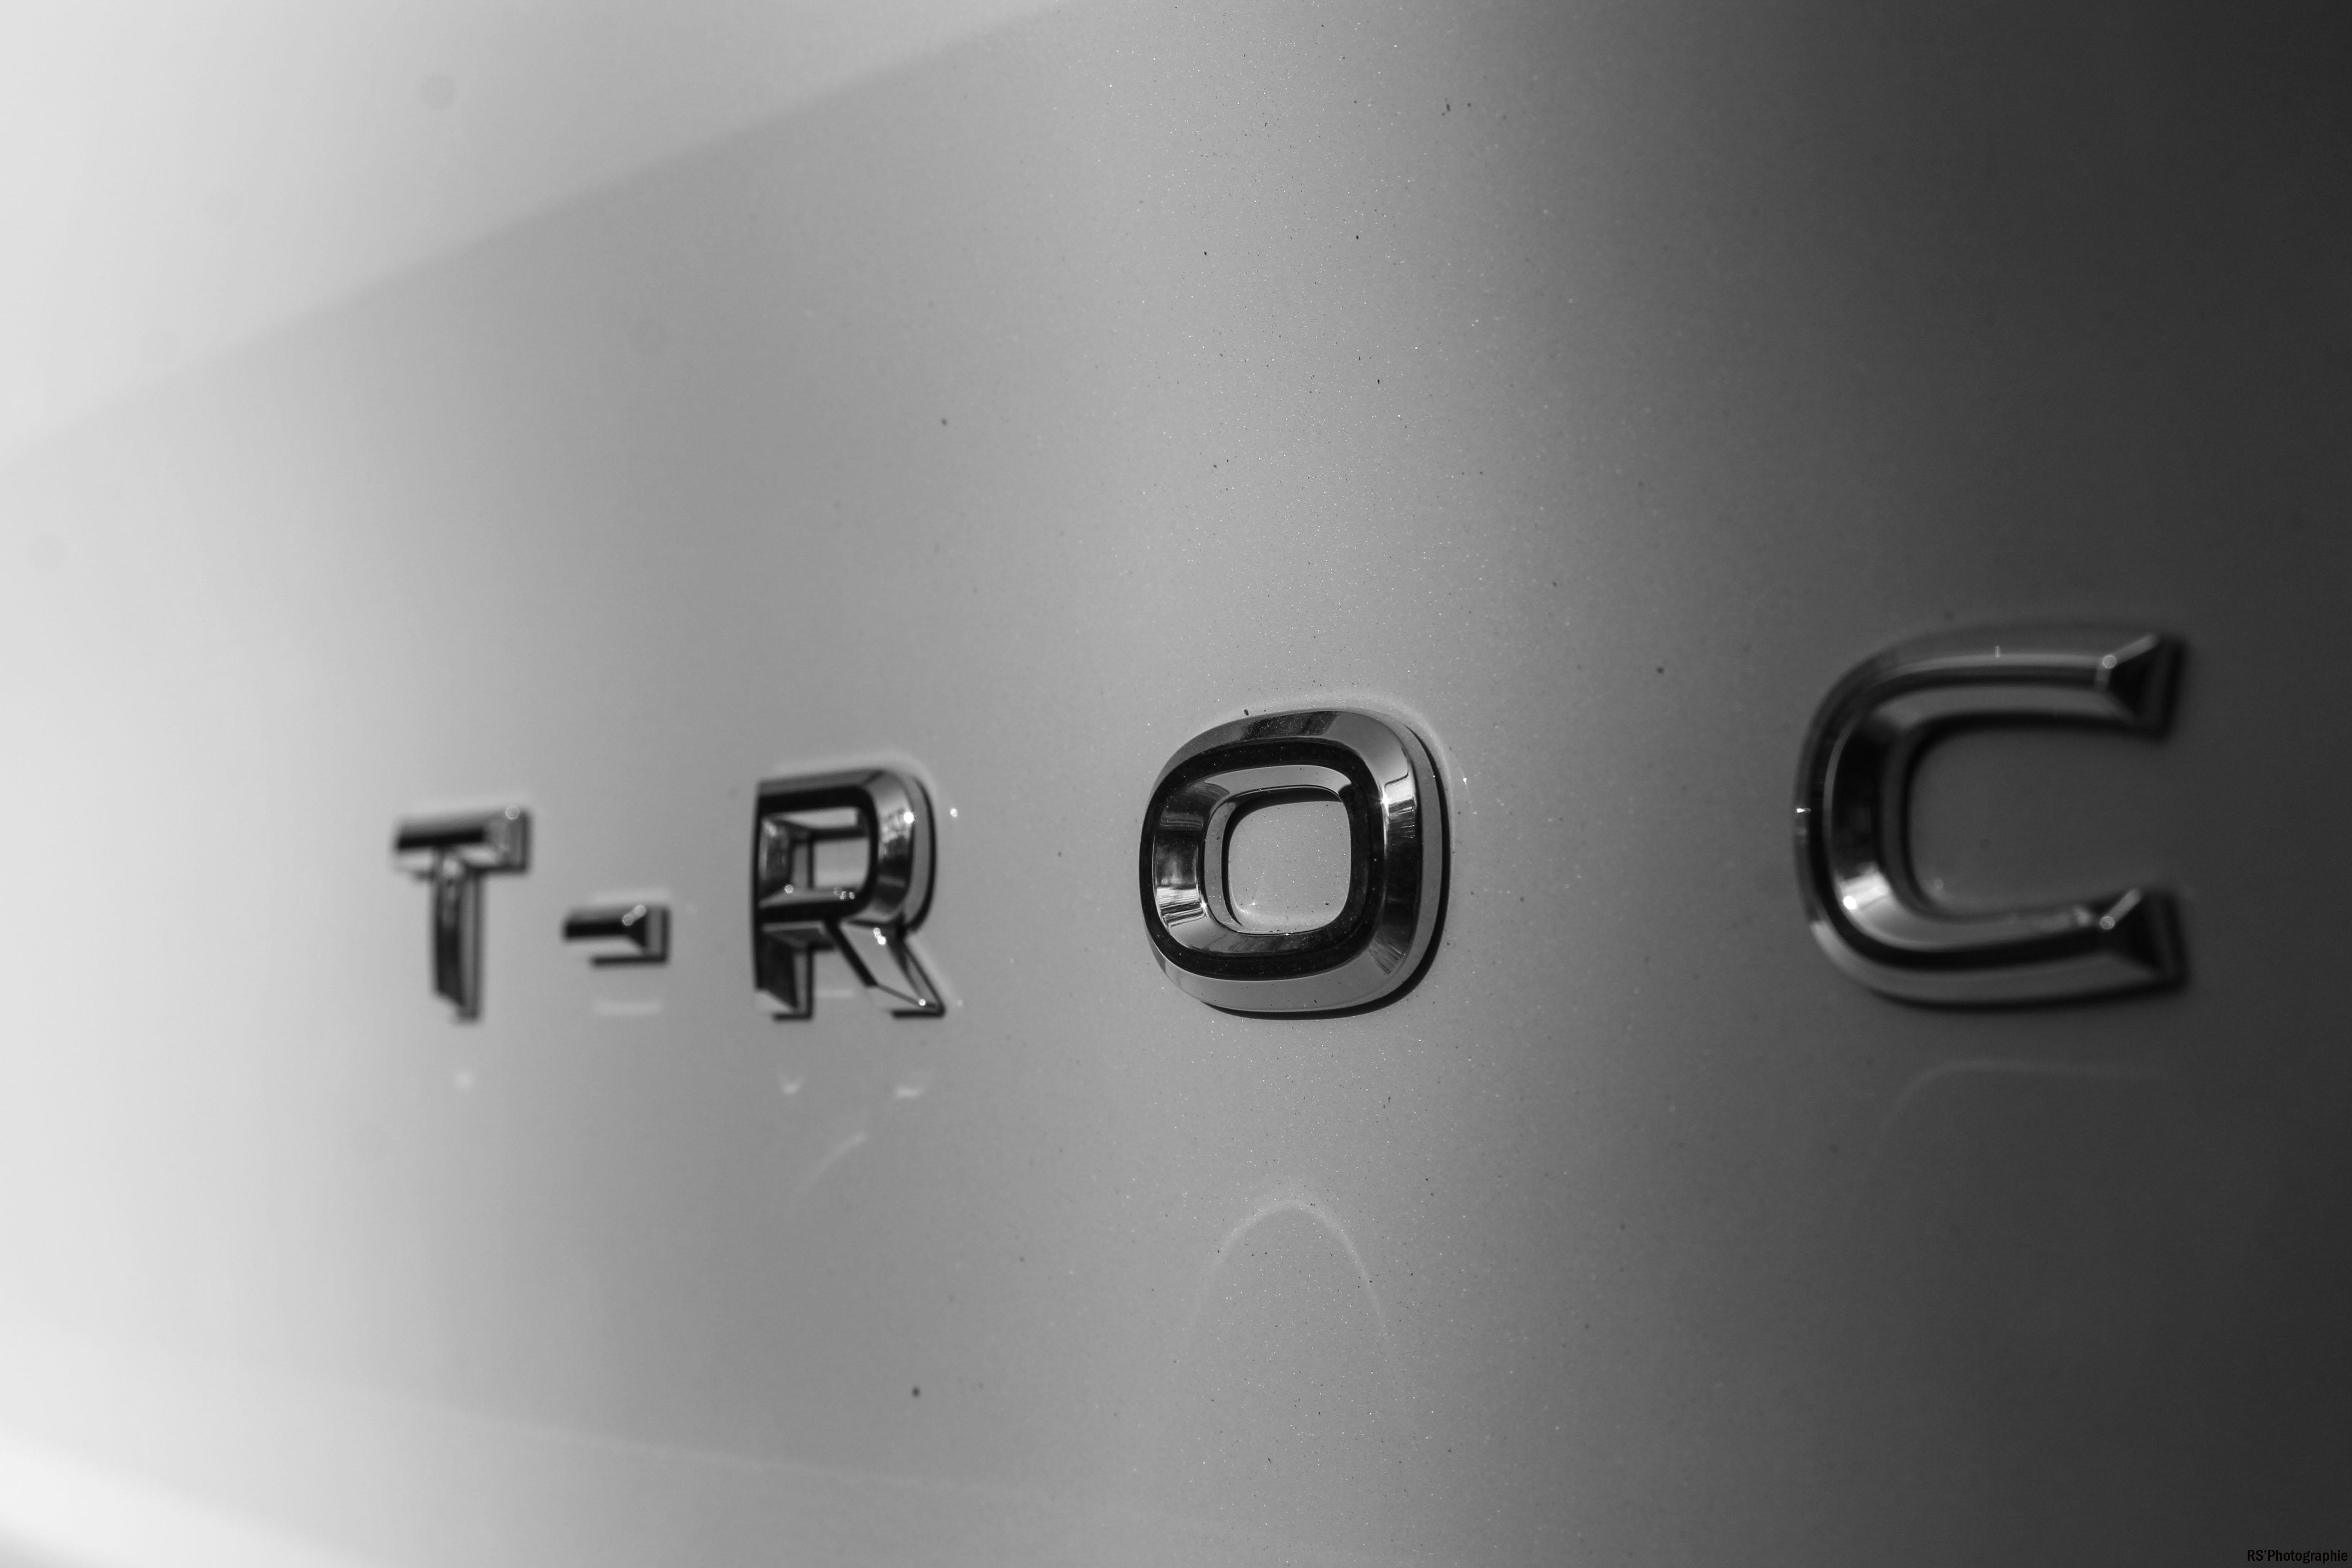 Volkswagentroc9-vw-t-roc-logo-Arnaud Demasier-RSPhotographie